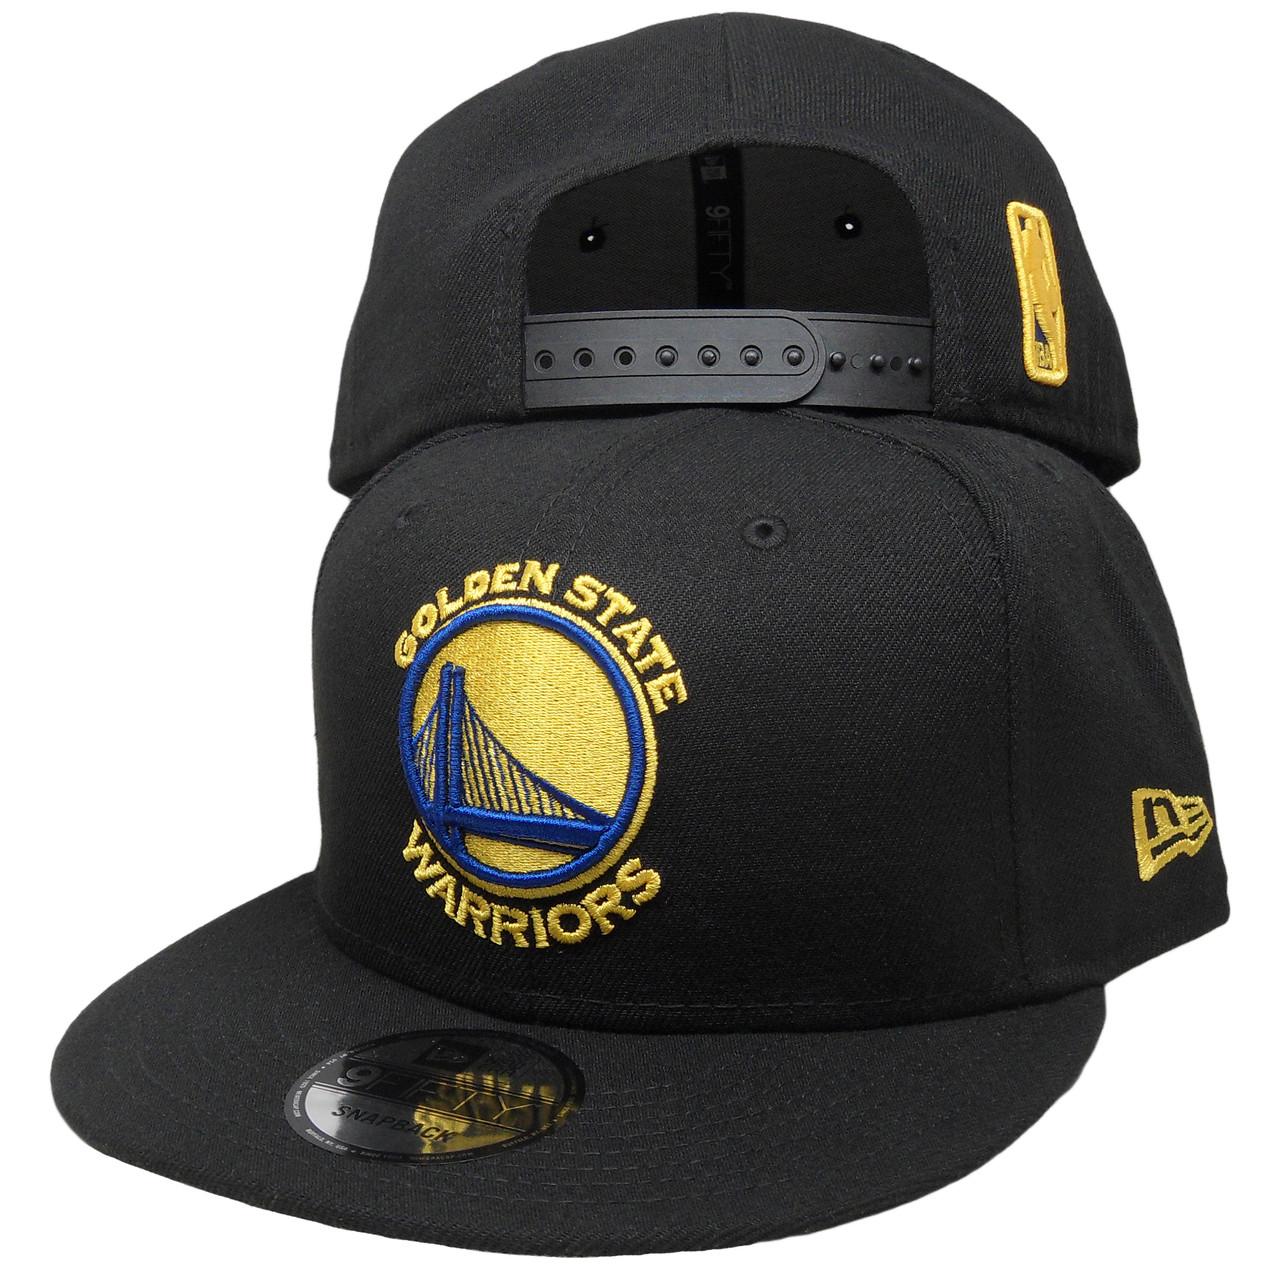 Golden State Warriors My 1st NBA Snapback New Era